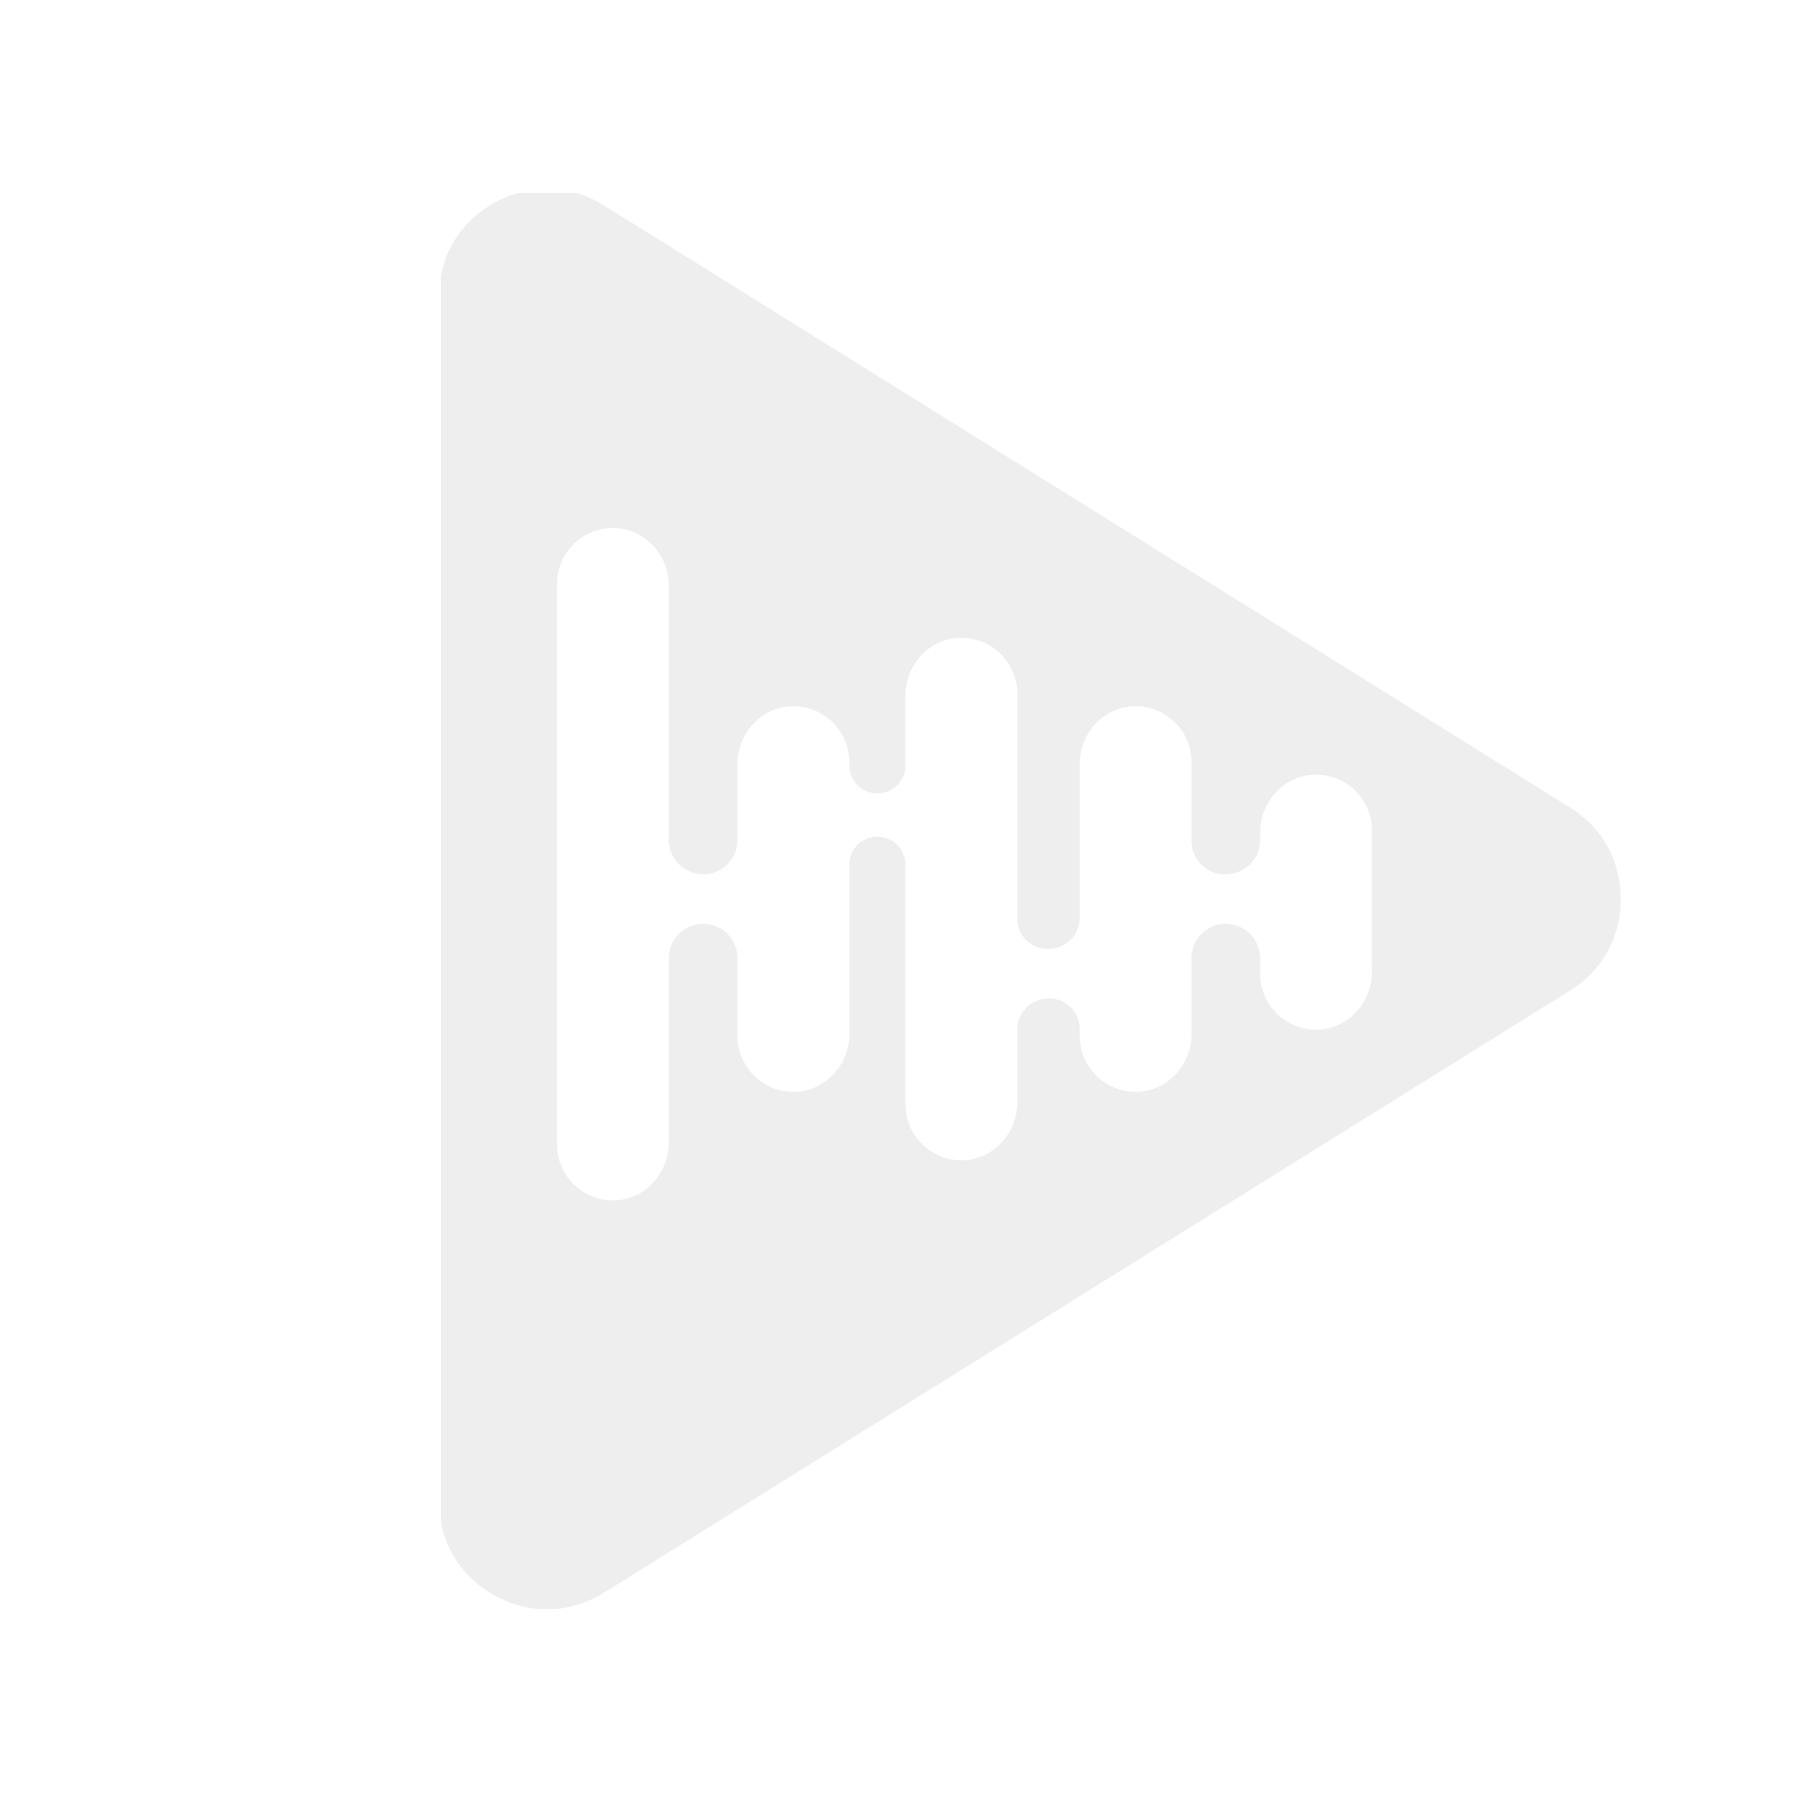 ACV ACV LK-6